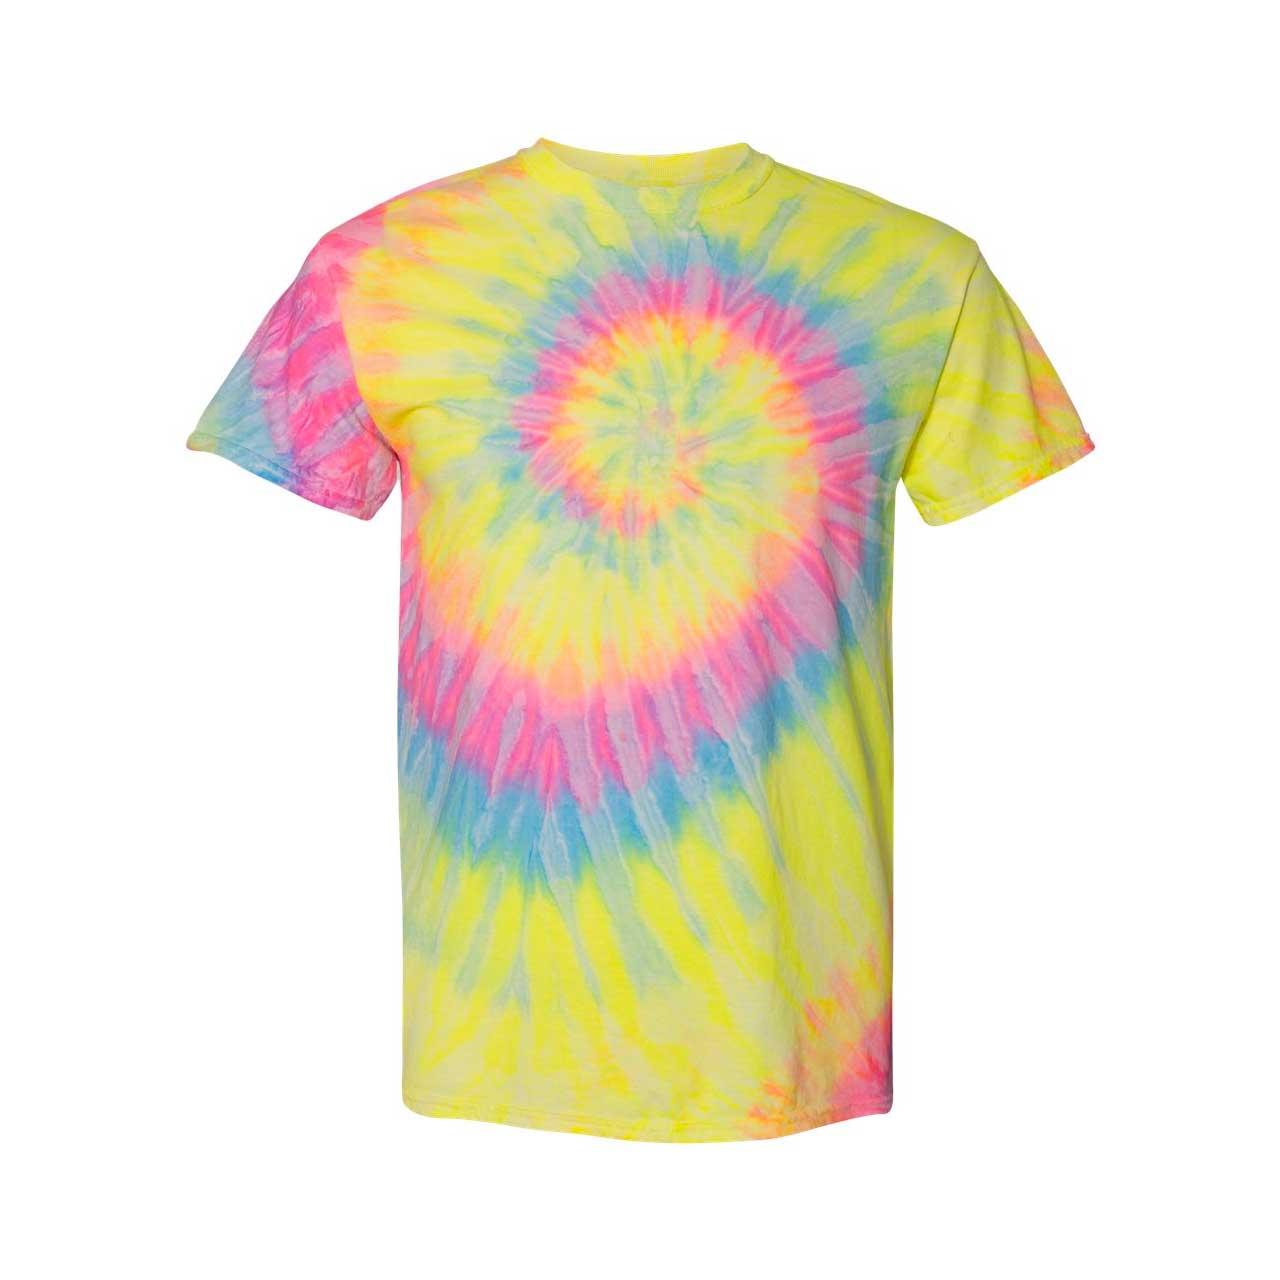 Vibrant spiral